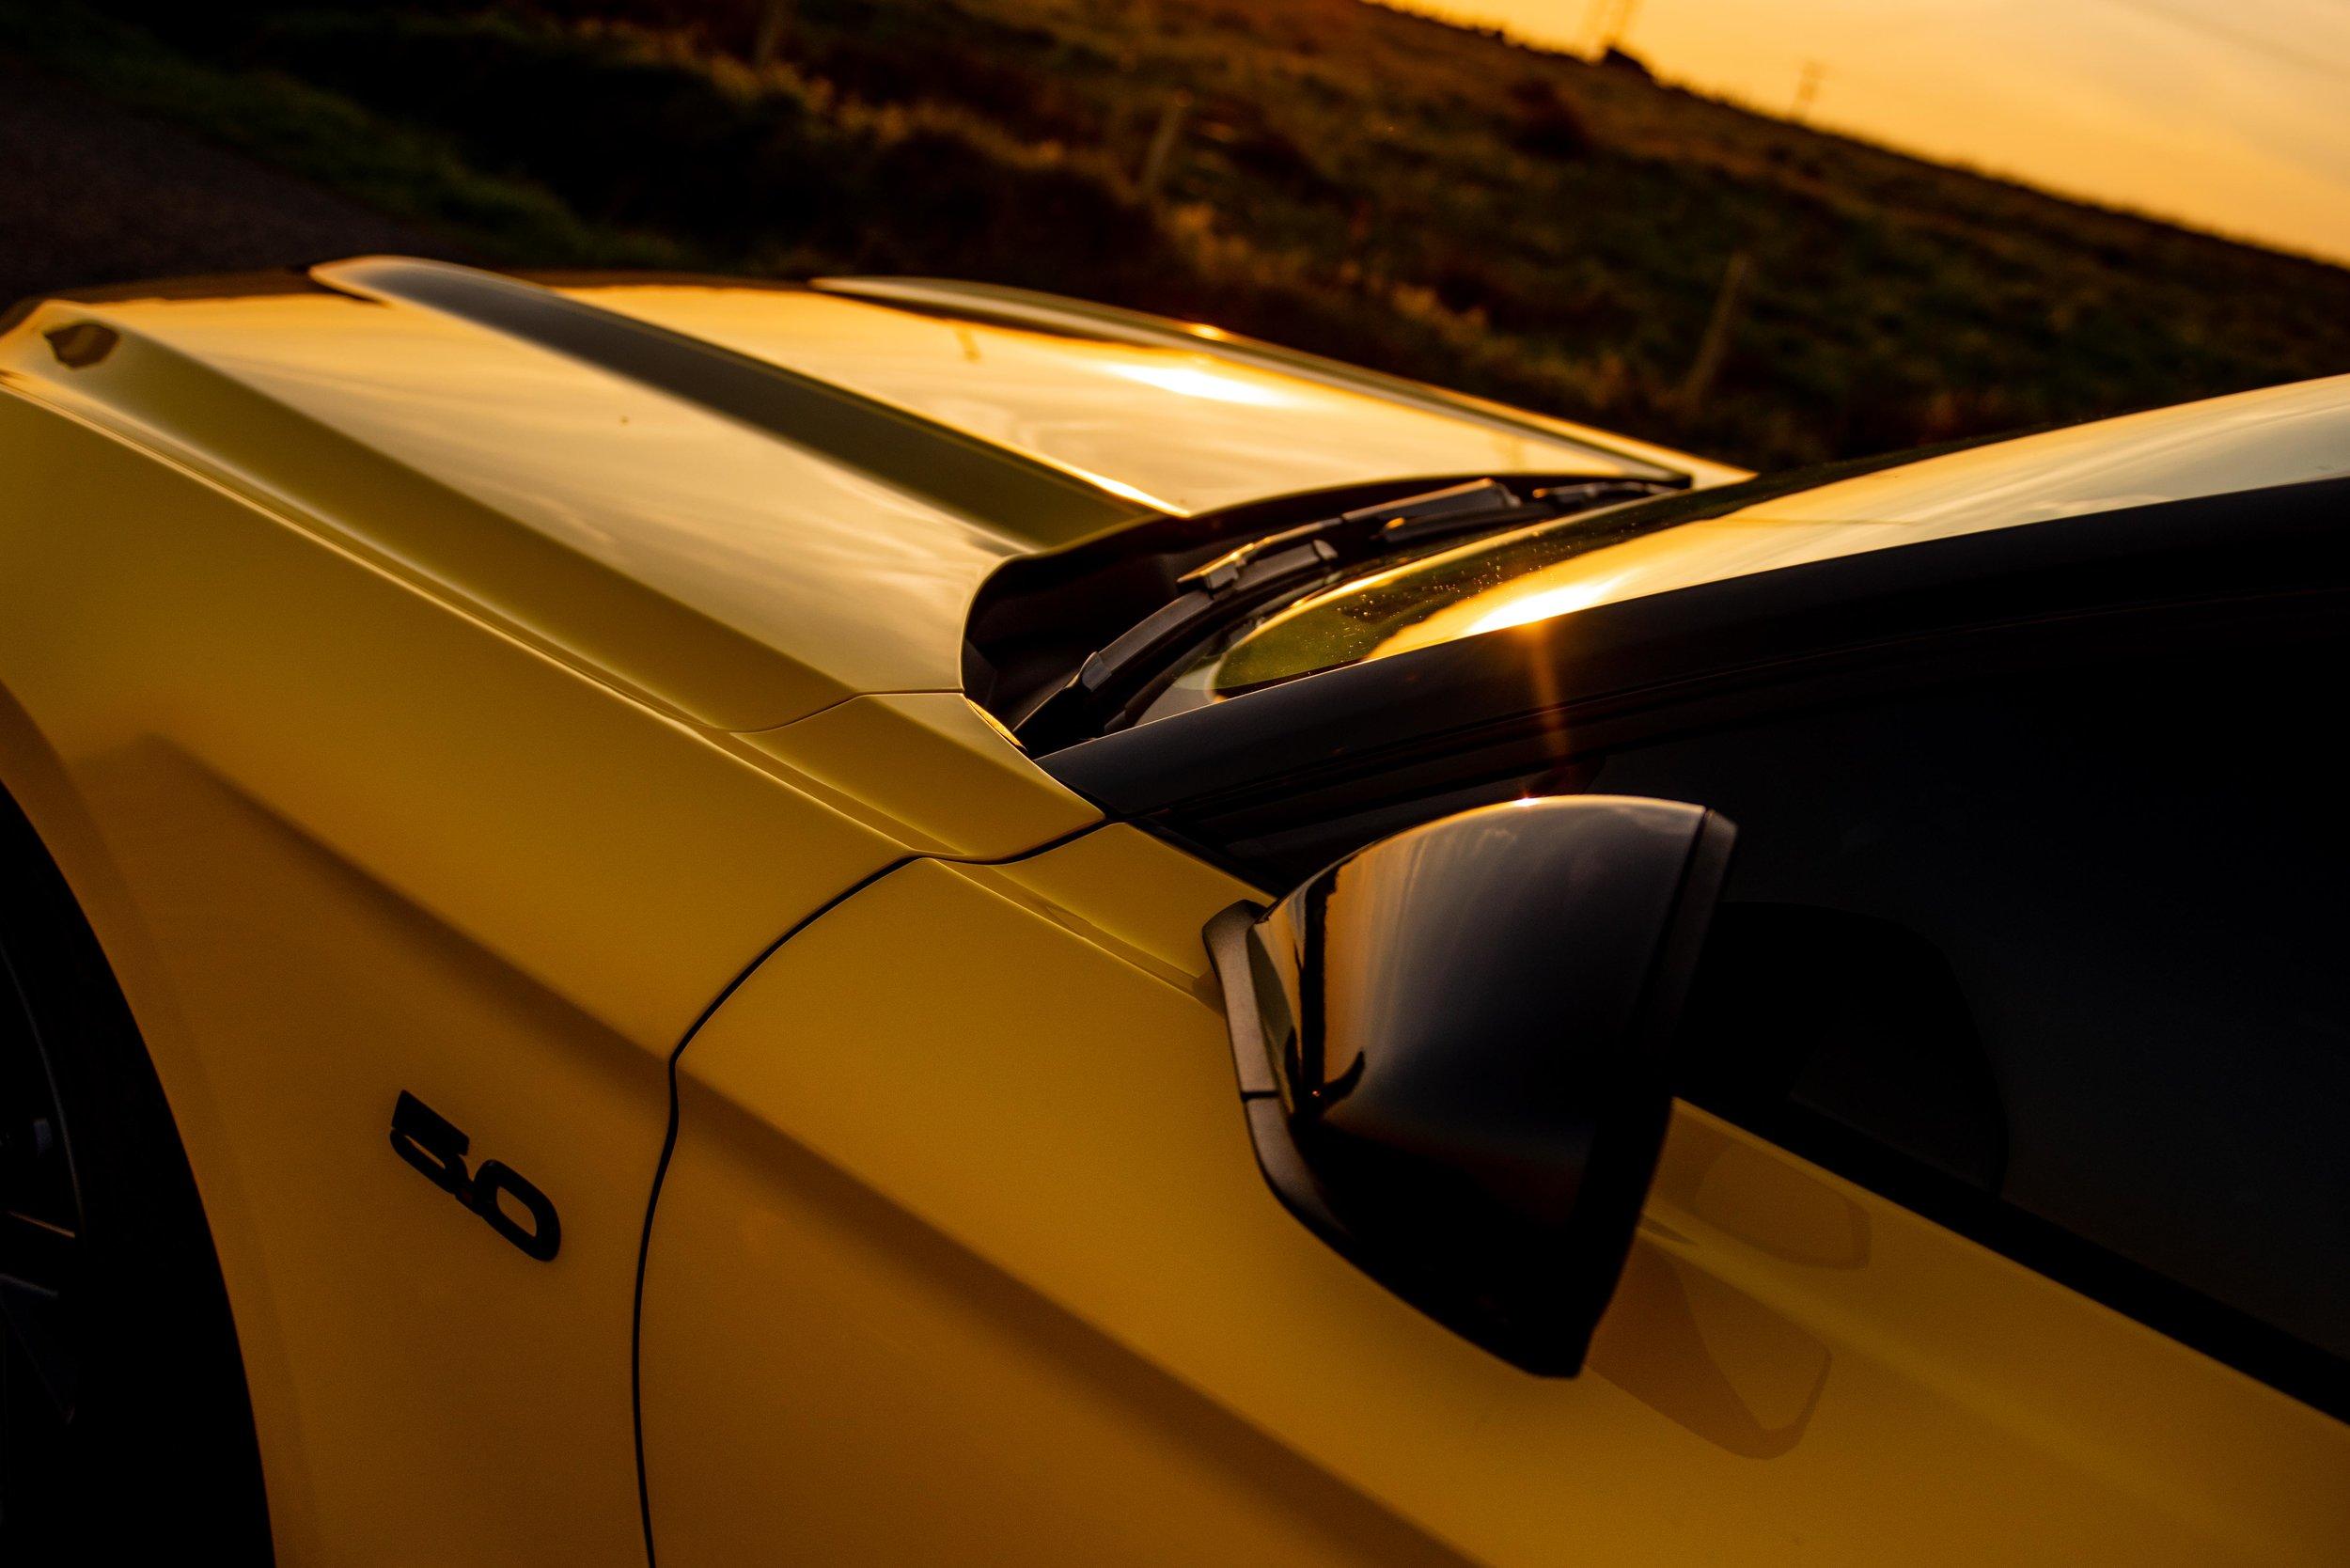 Mustang-18.jpg